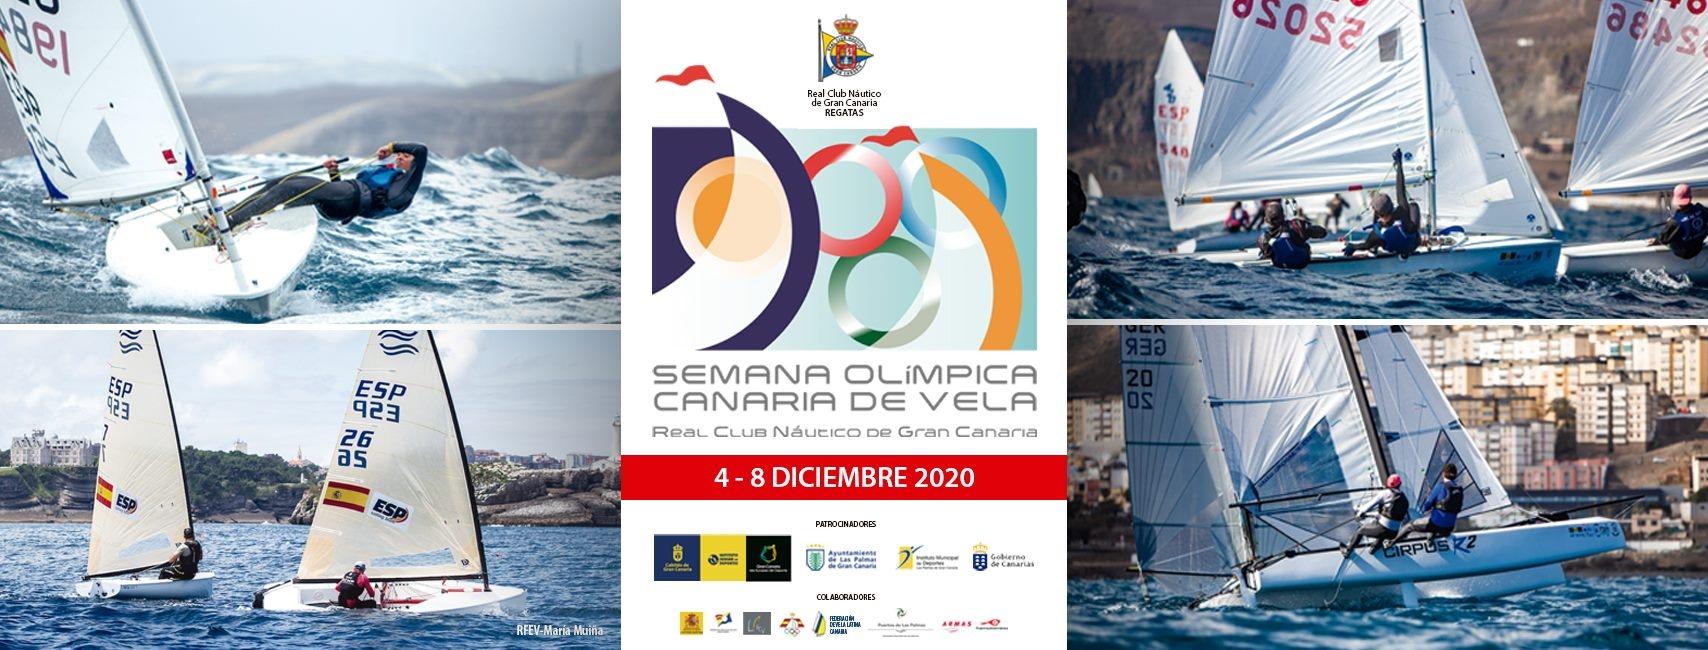 Olympic Classes - Canarian Olympic Week - Gran Canaria ESP